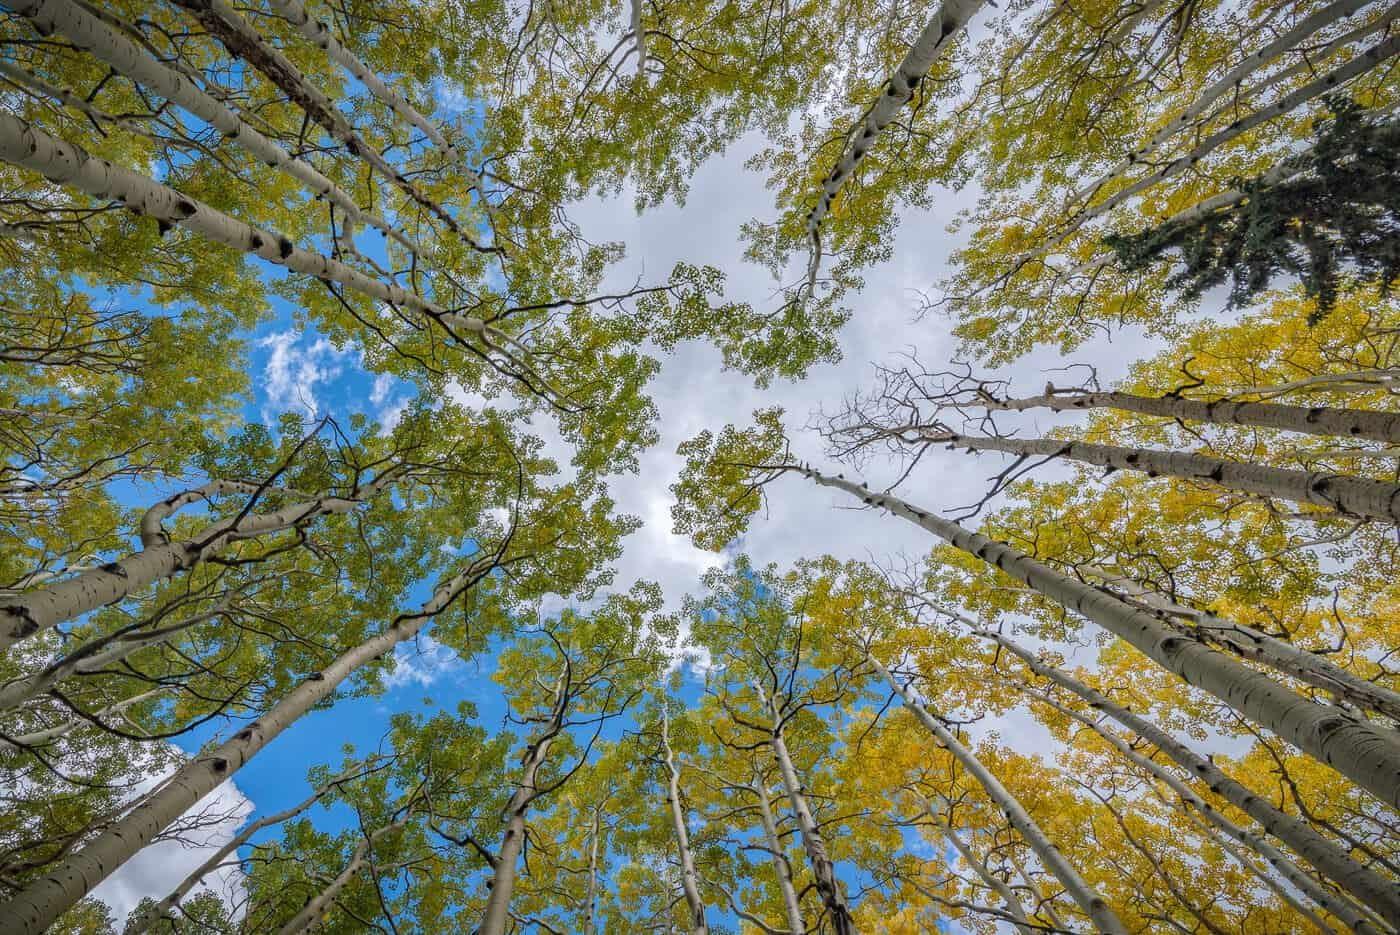 Looking Up at Lockett Meadow